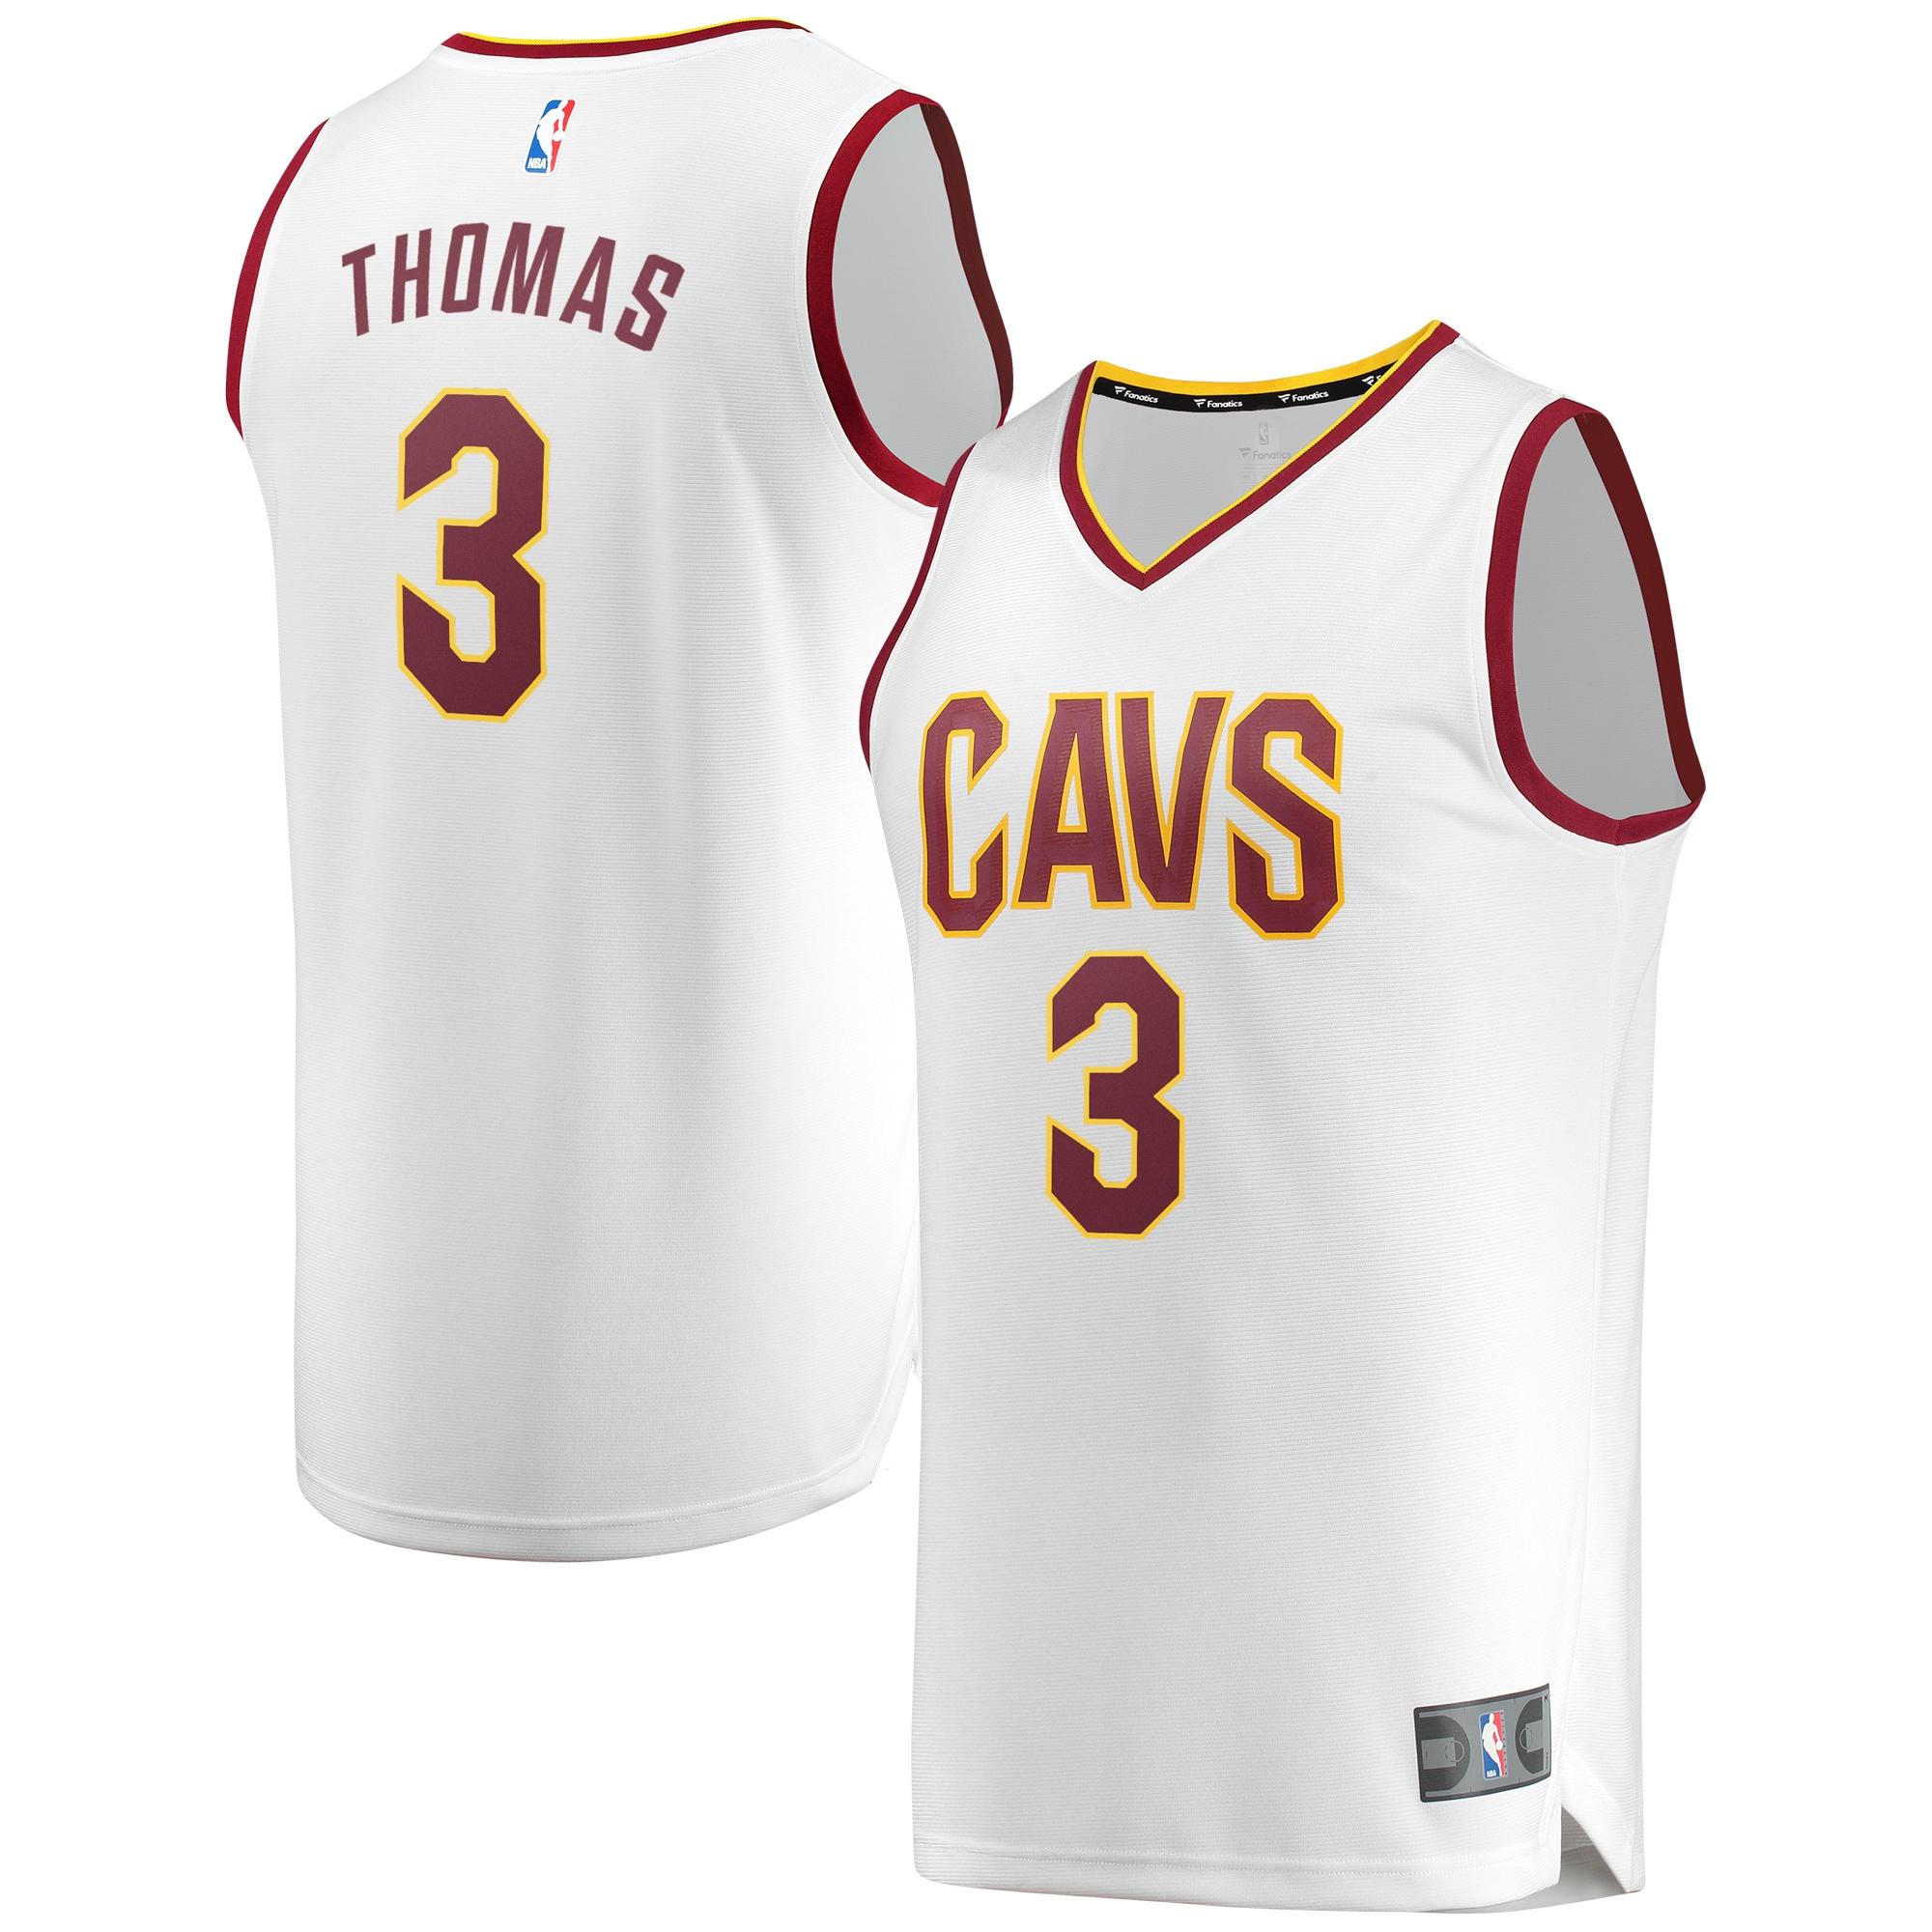 Isaiah Thomas Cleveland Cavaliers Fanatics Branded Fast Break Replica Jersey White - Association Edition